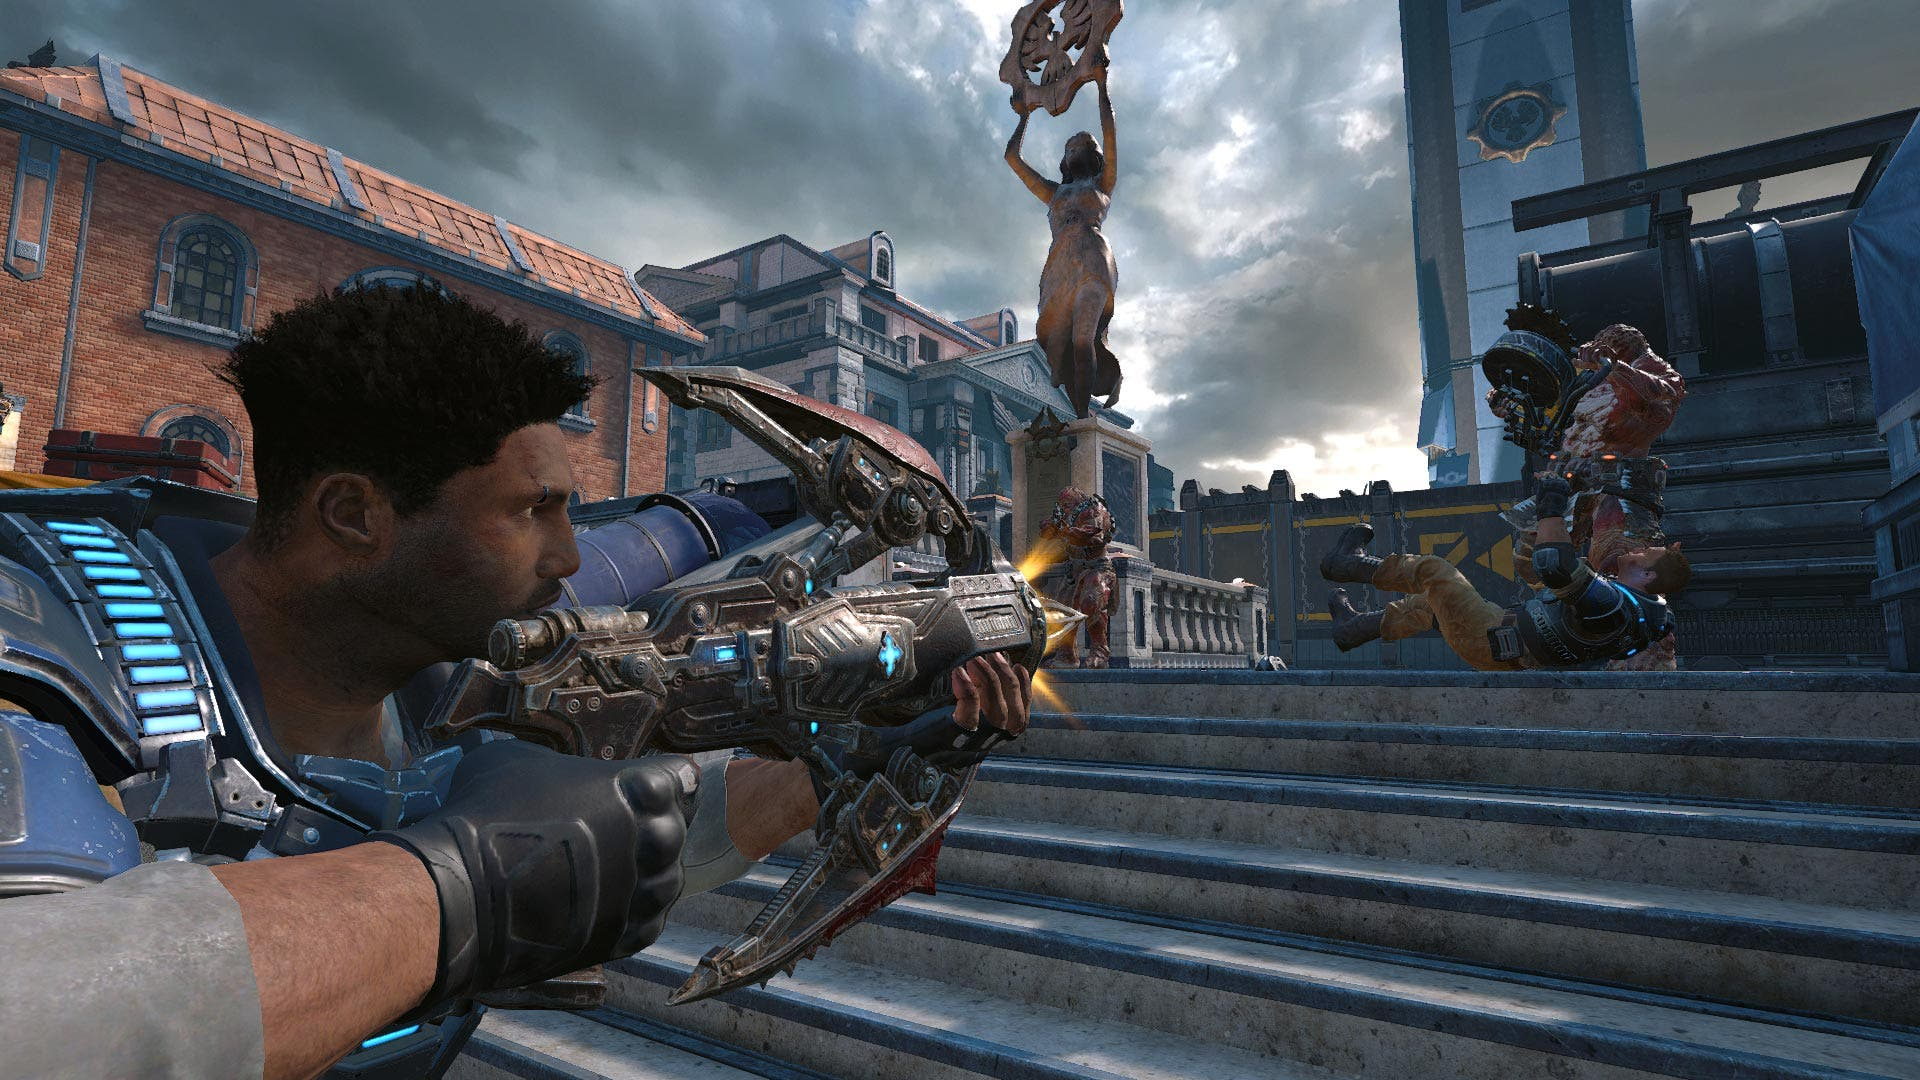 gears-of-war-4-multiplayer-beta-7